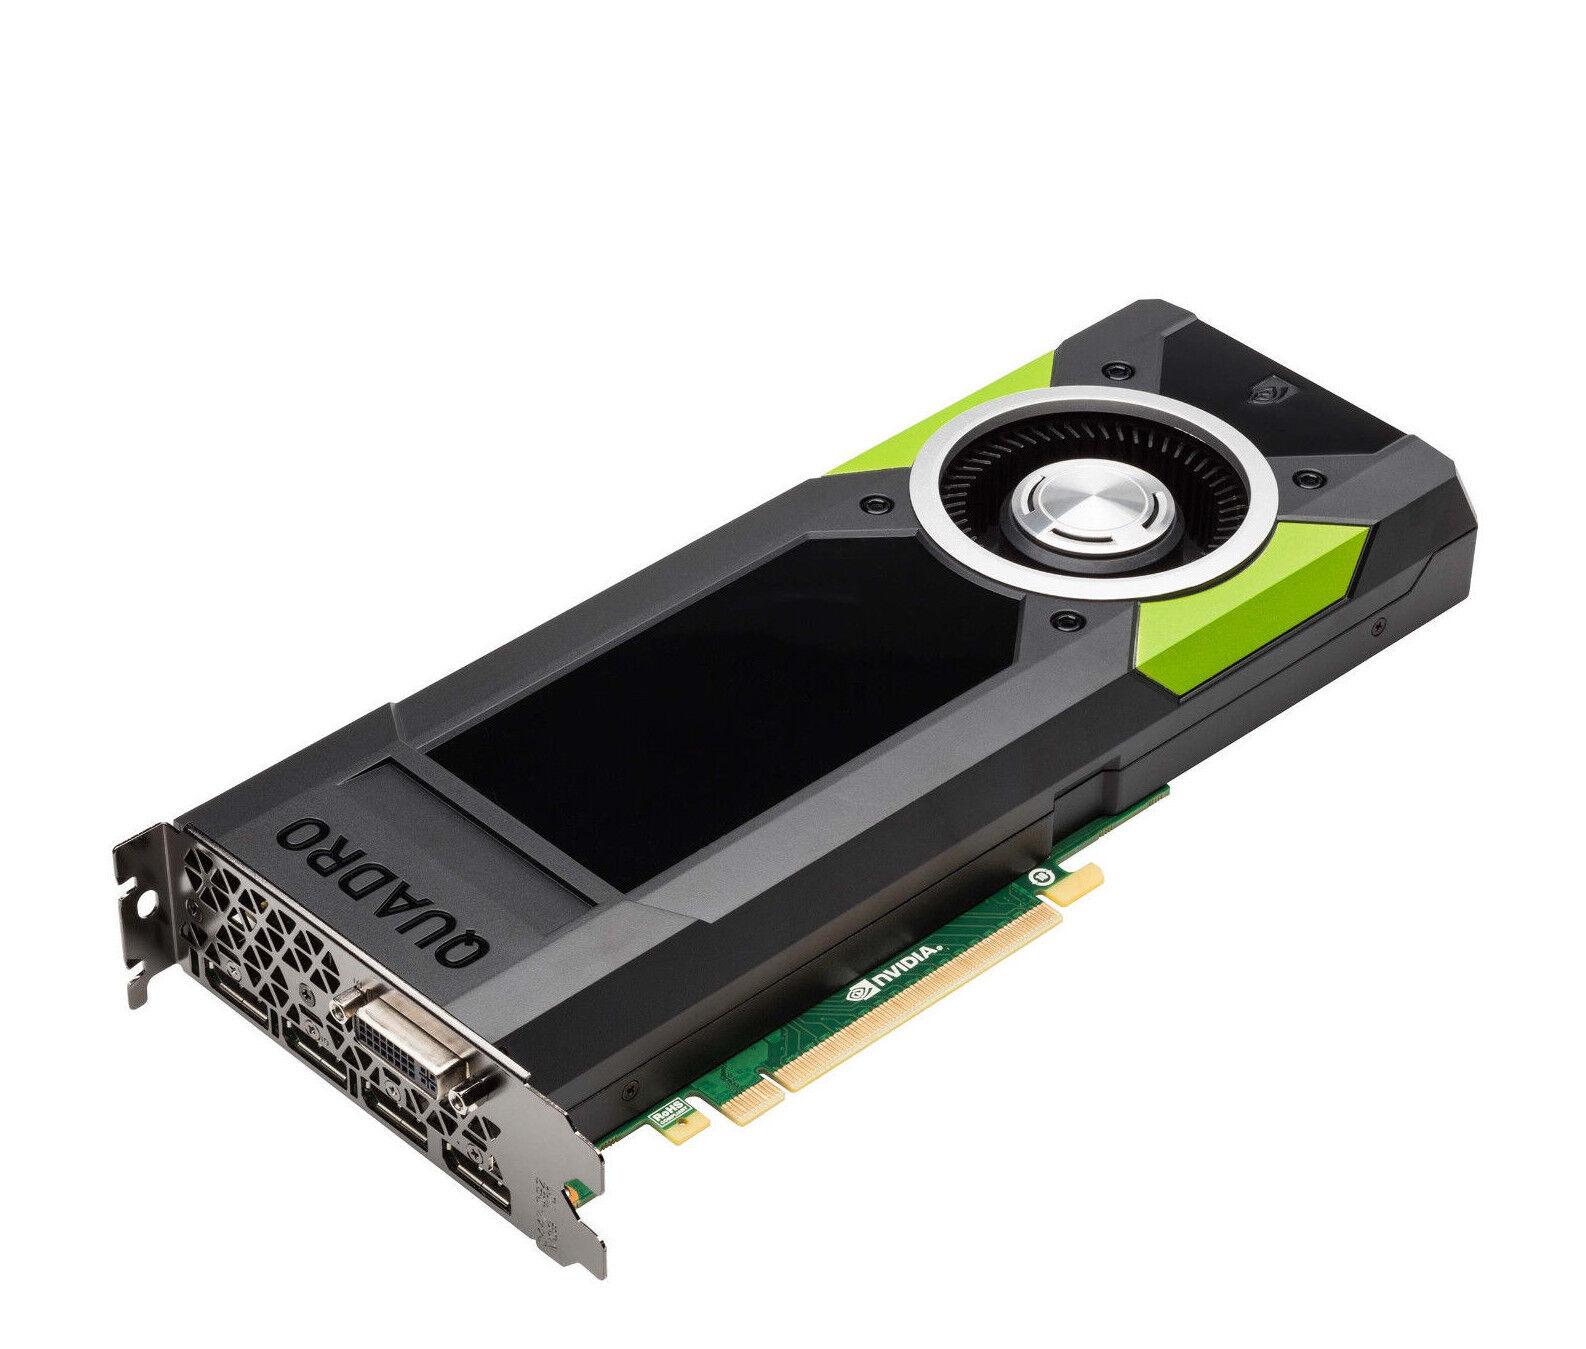 NVIDIA Quadro M5000 4K Grafikkarte 8GB 4x DP 1.2 DVI OpenCL OpenGL HDCP CUDA